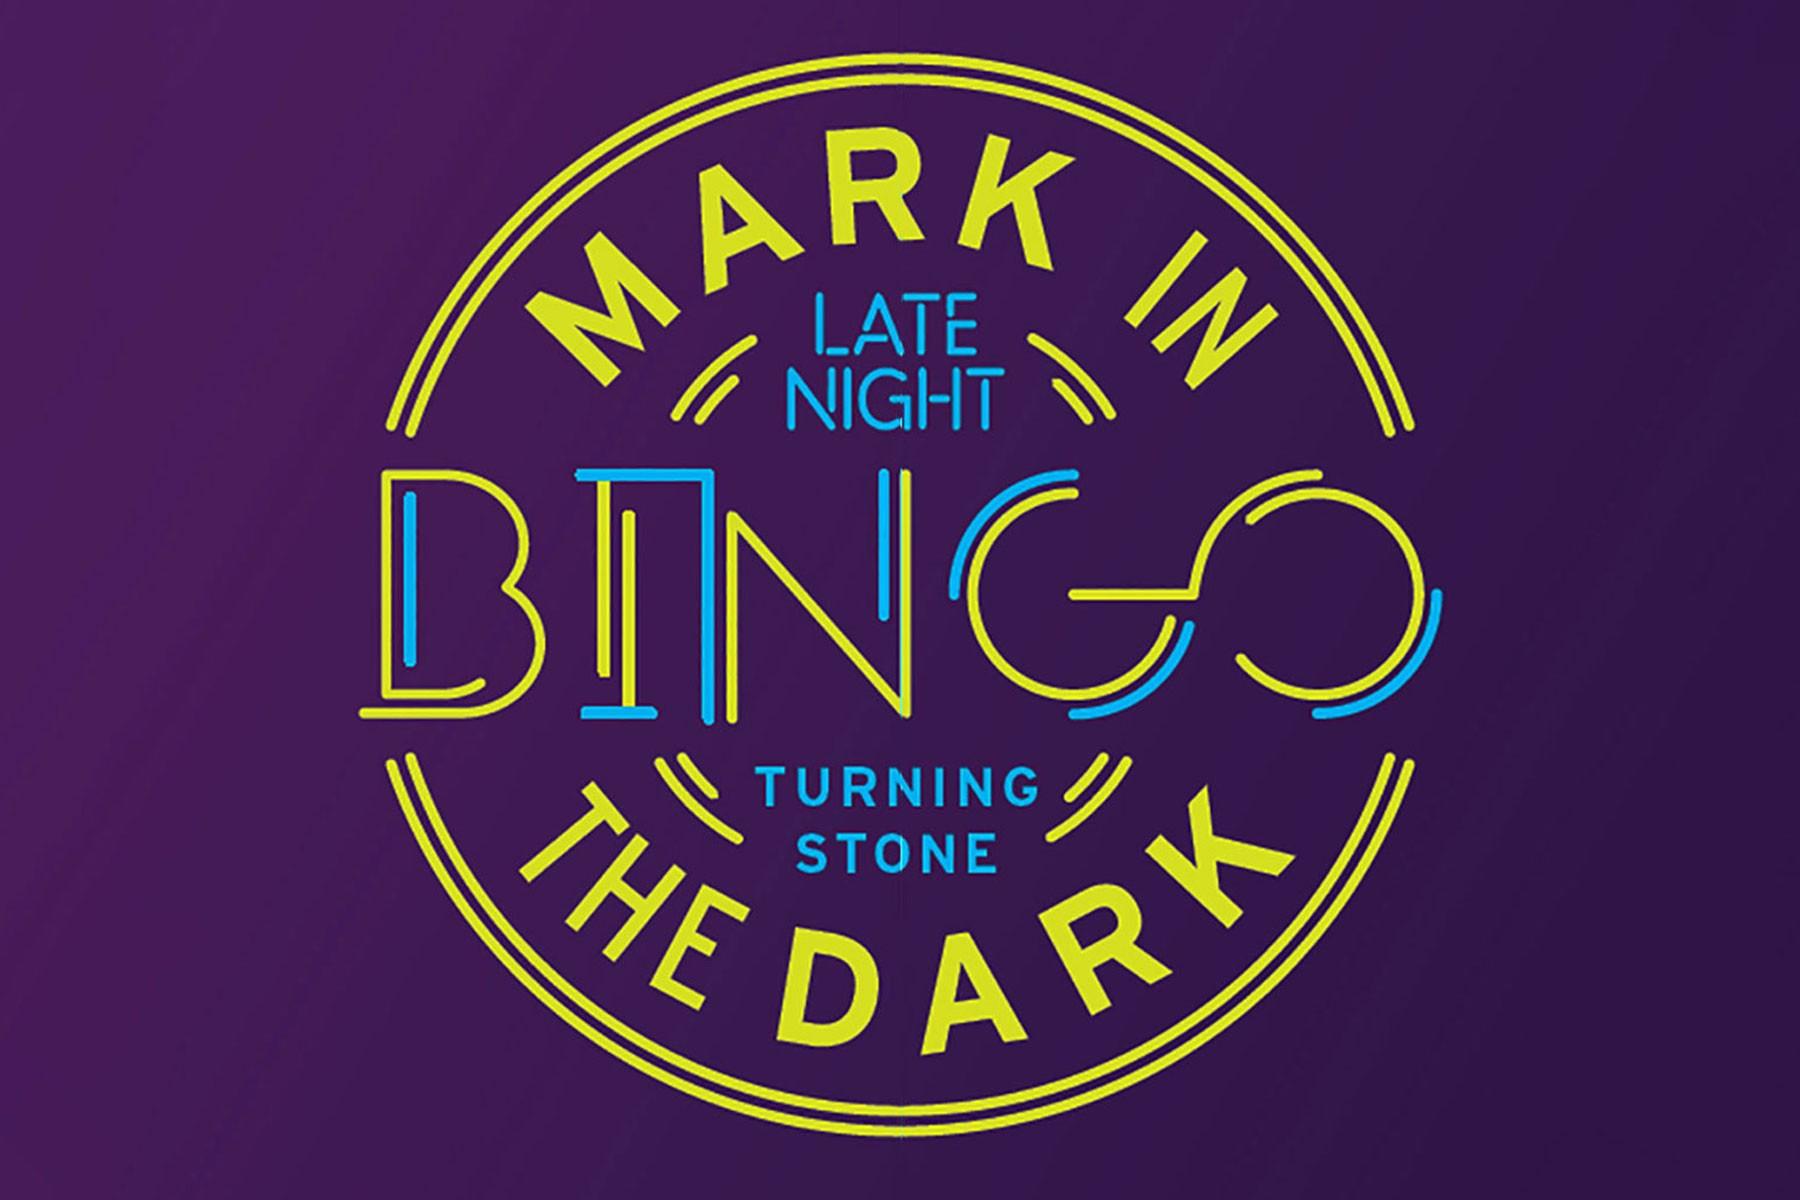 Casino Promotions | Turning Stone Resort Casino Throughout Monthly Calender For Turning Stone Bingo